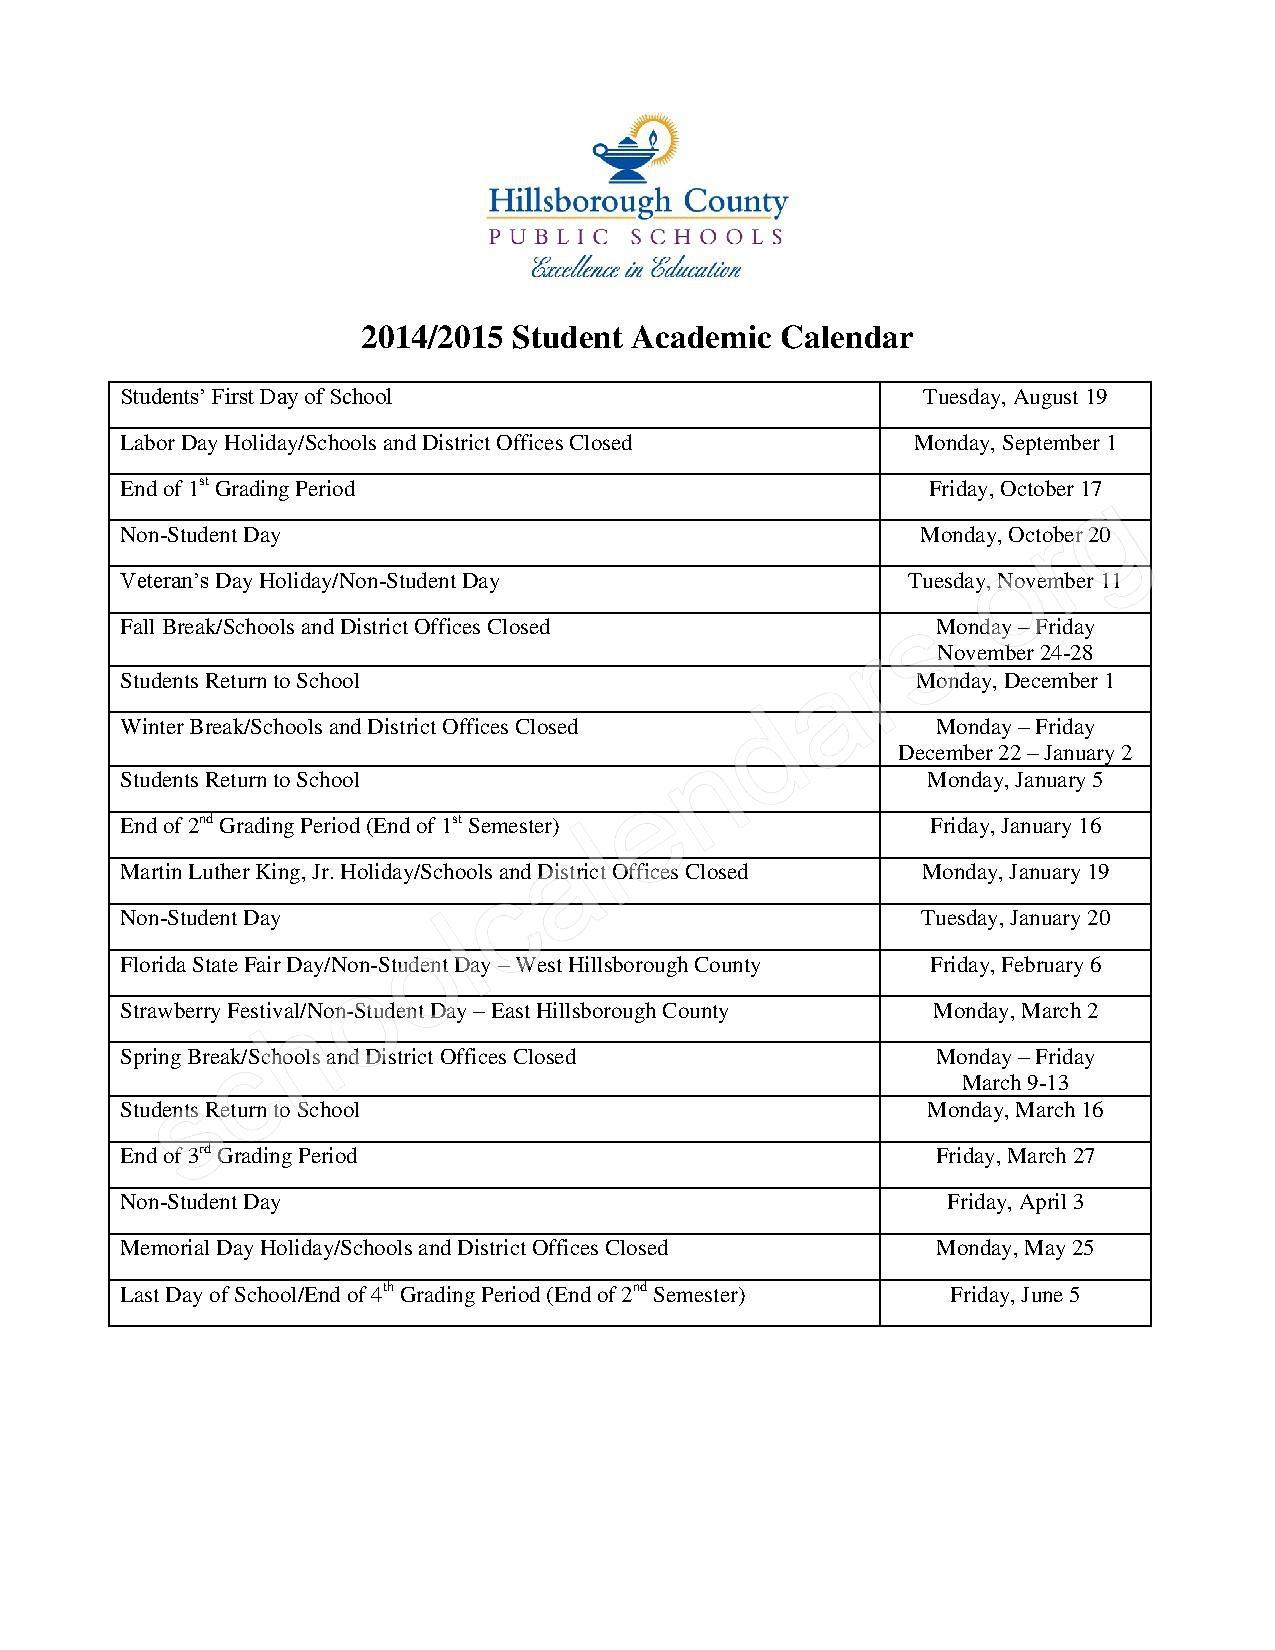 Hillsborough County School Calendar